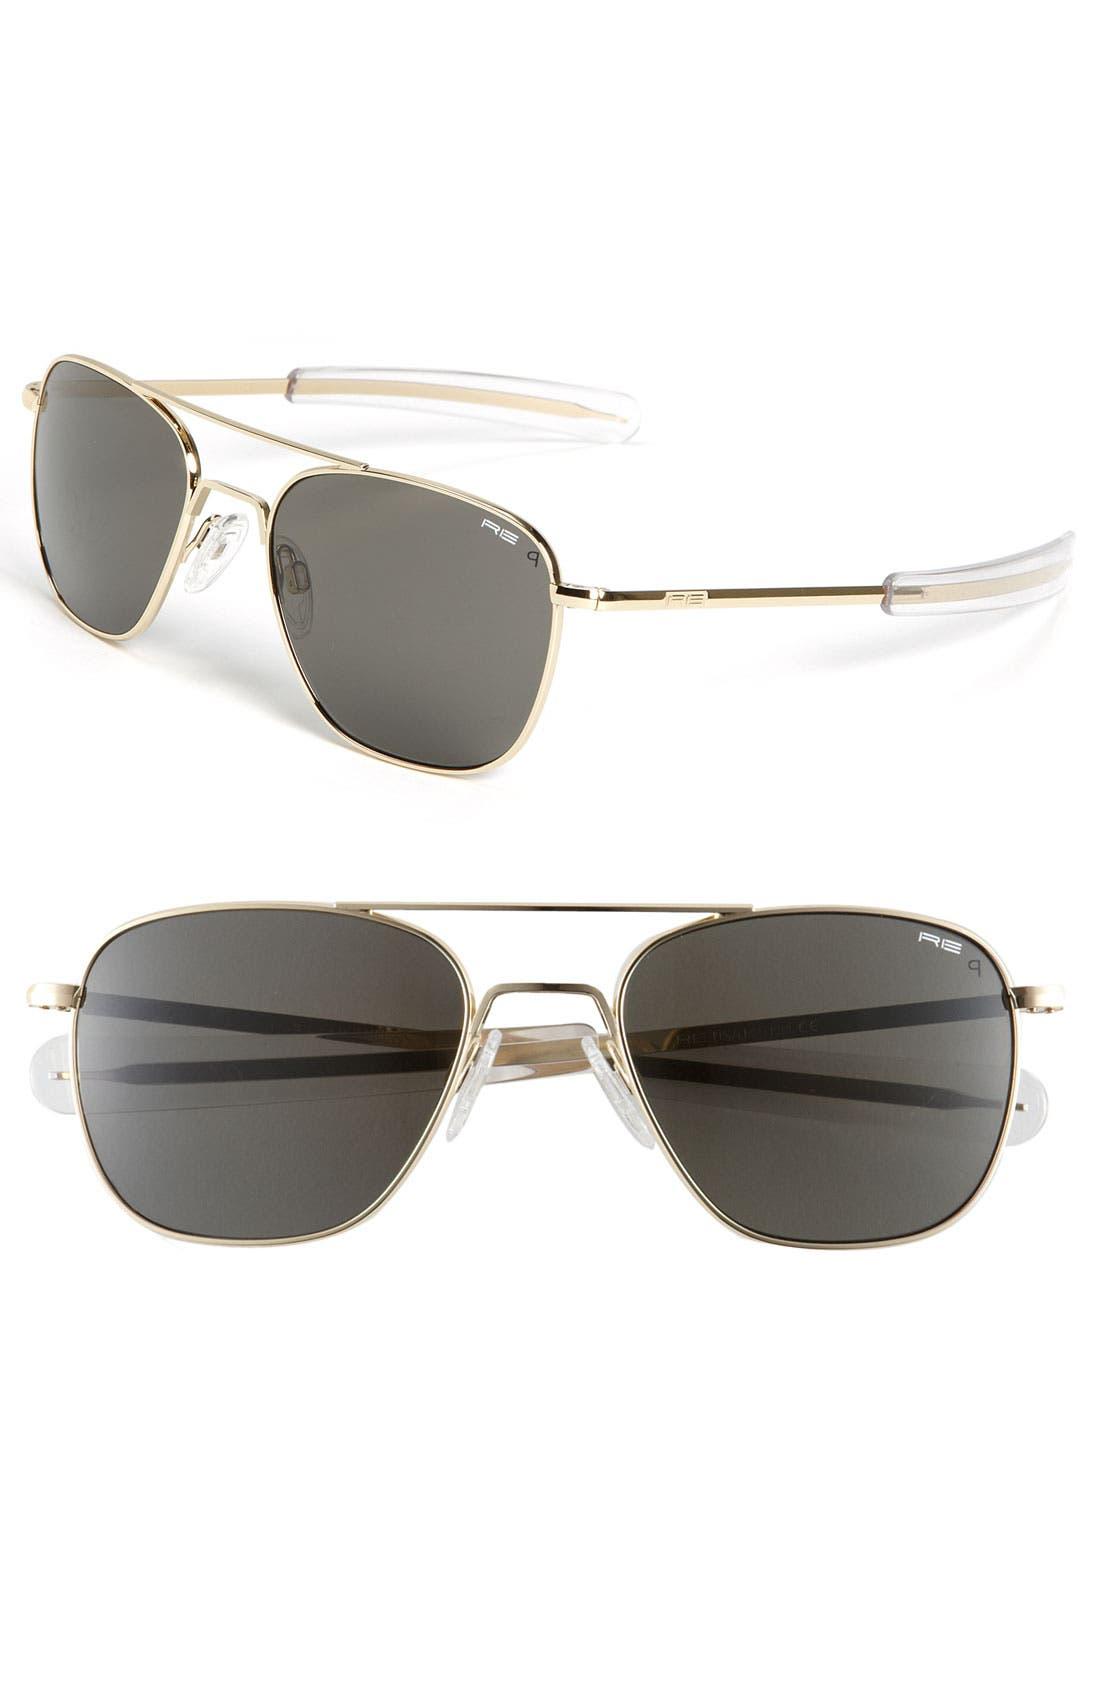 Alternate Image 1 Selected - Randolph Engineering 'Signature' Polarized Aviator 55mm Sunglasses